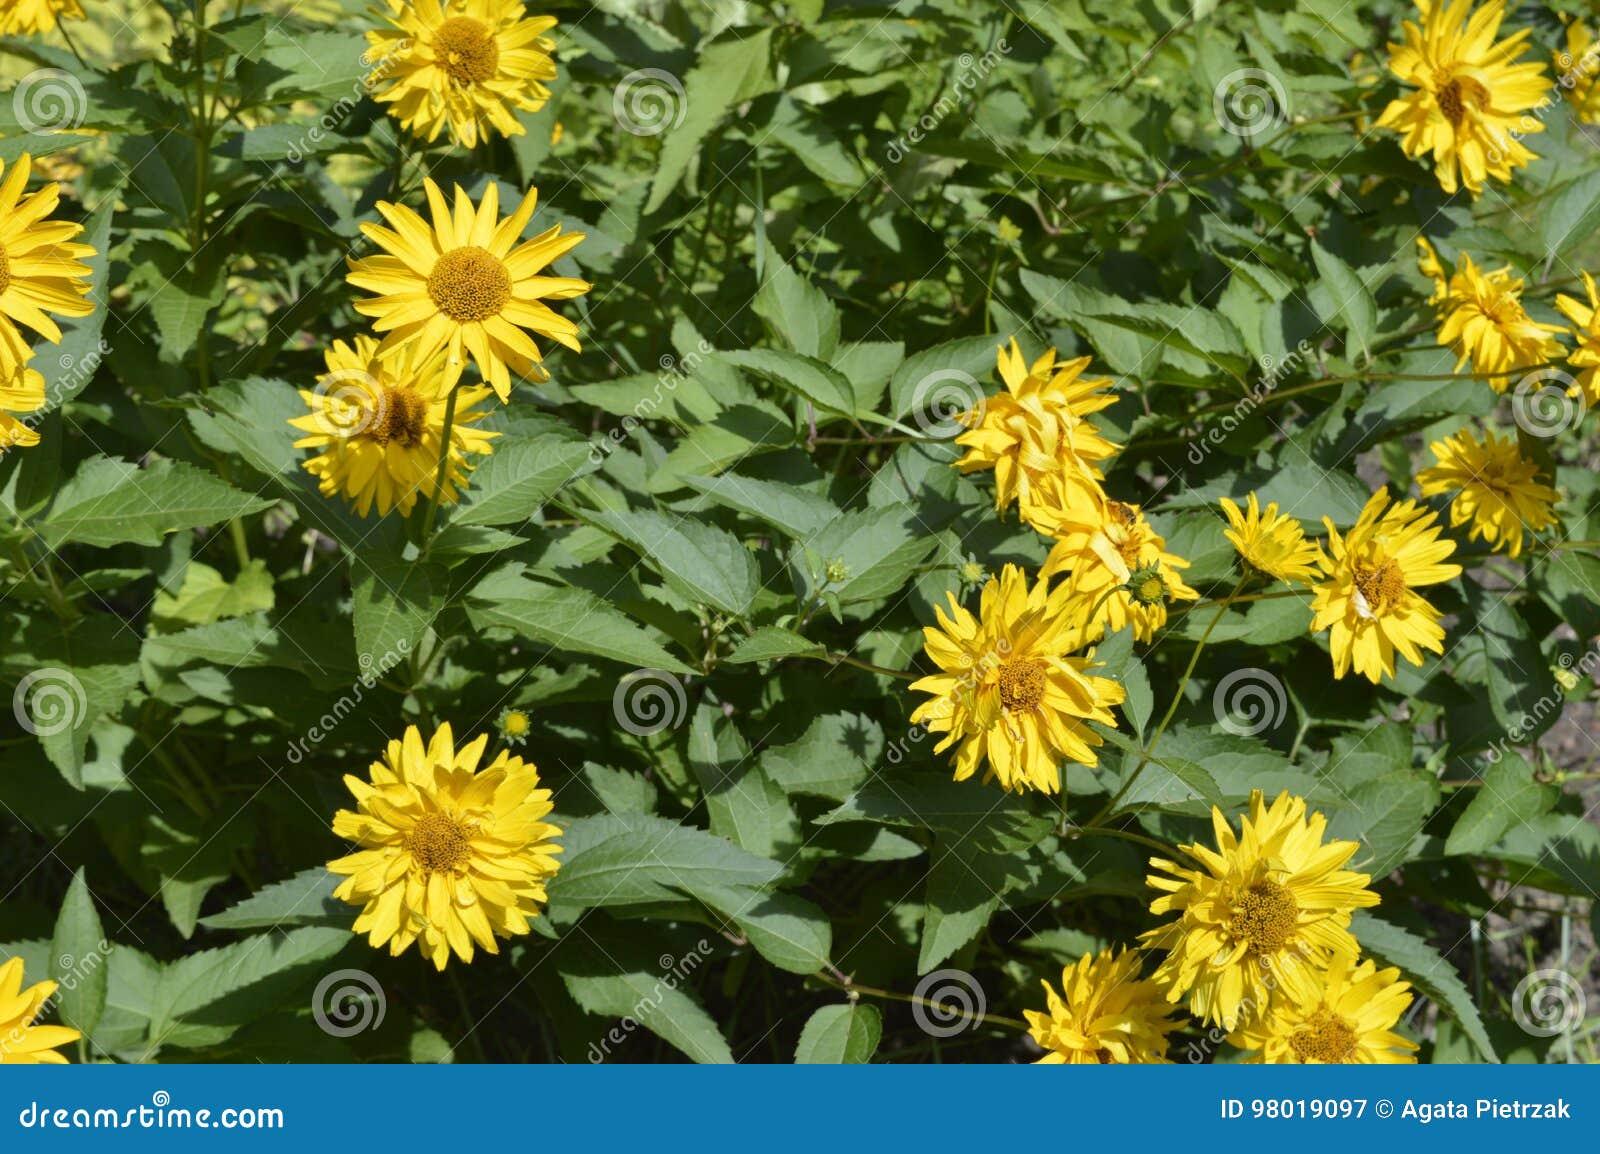 Yellow daisies stock image image of flower daisy composite 98019097 beautiful tall flowers like yellow daisies izmirmasajfo